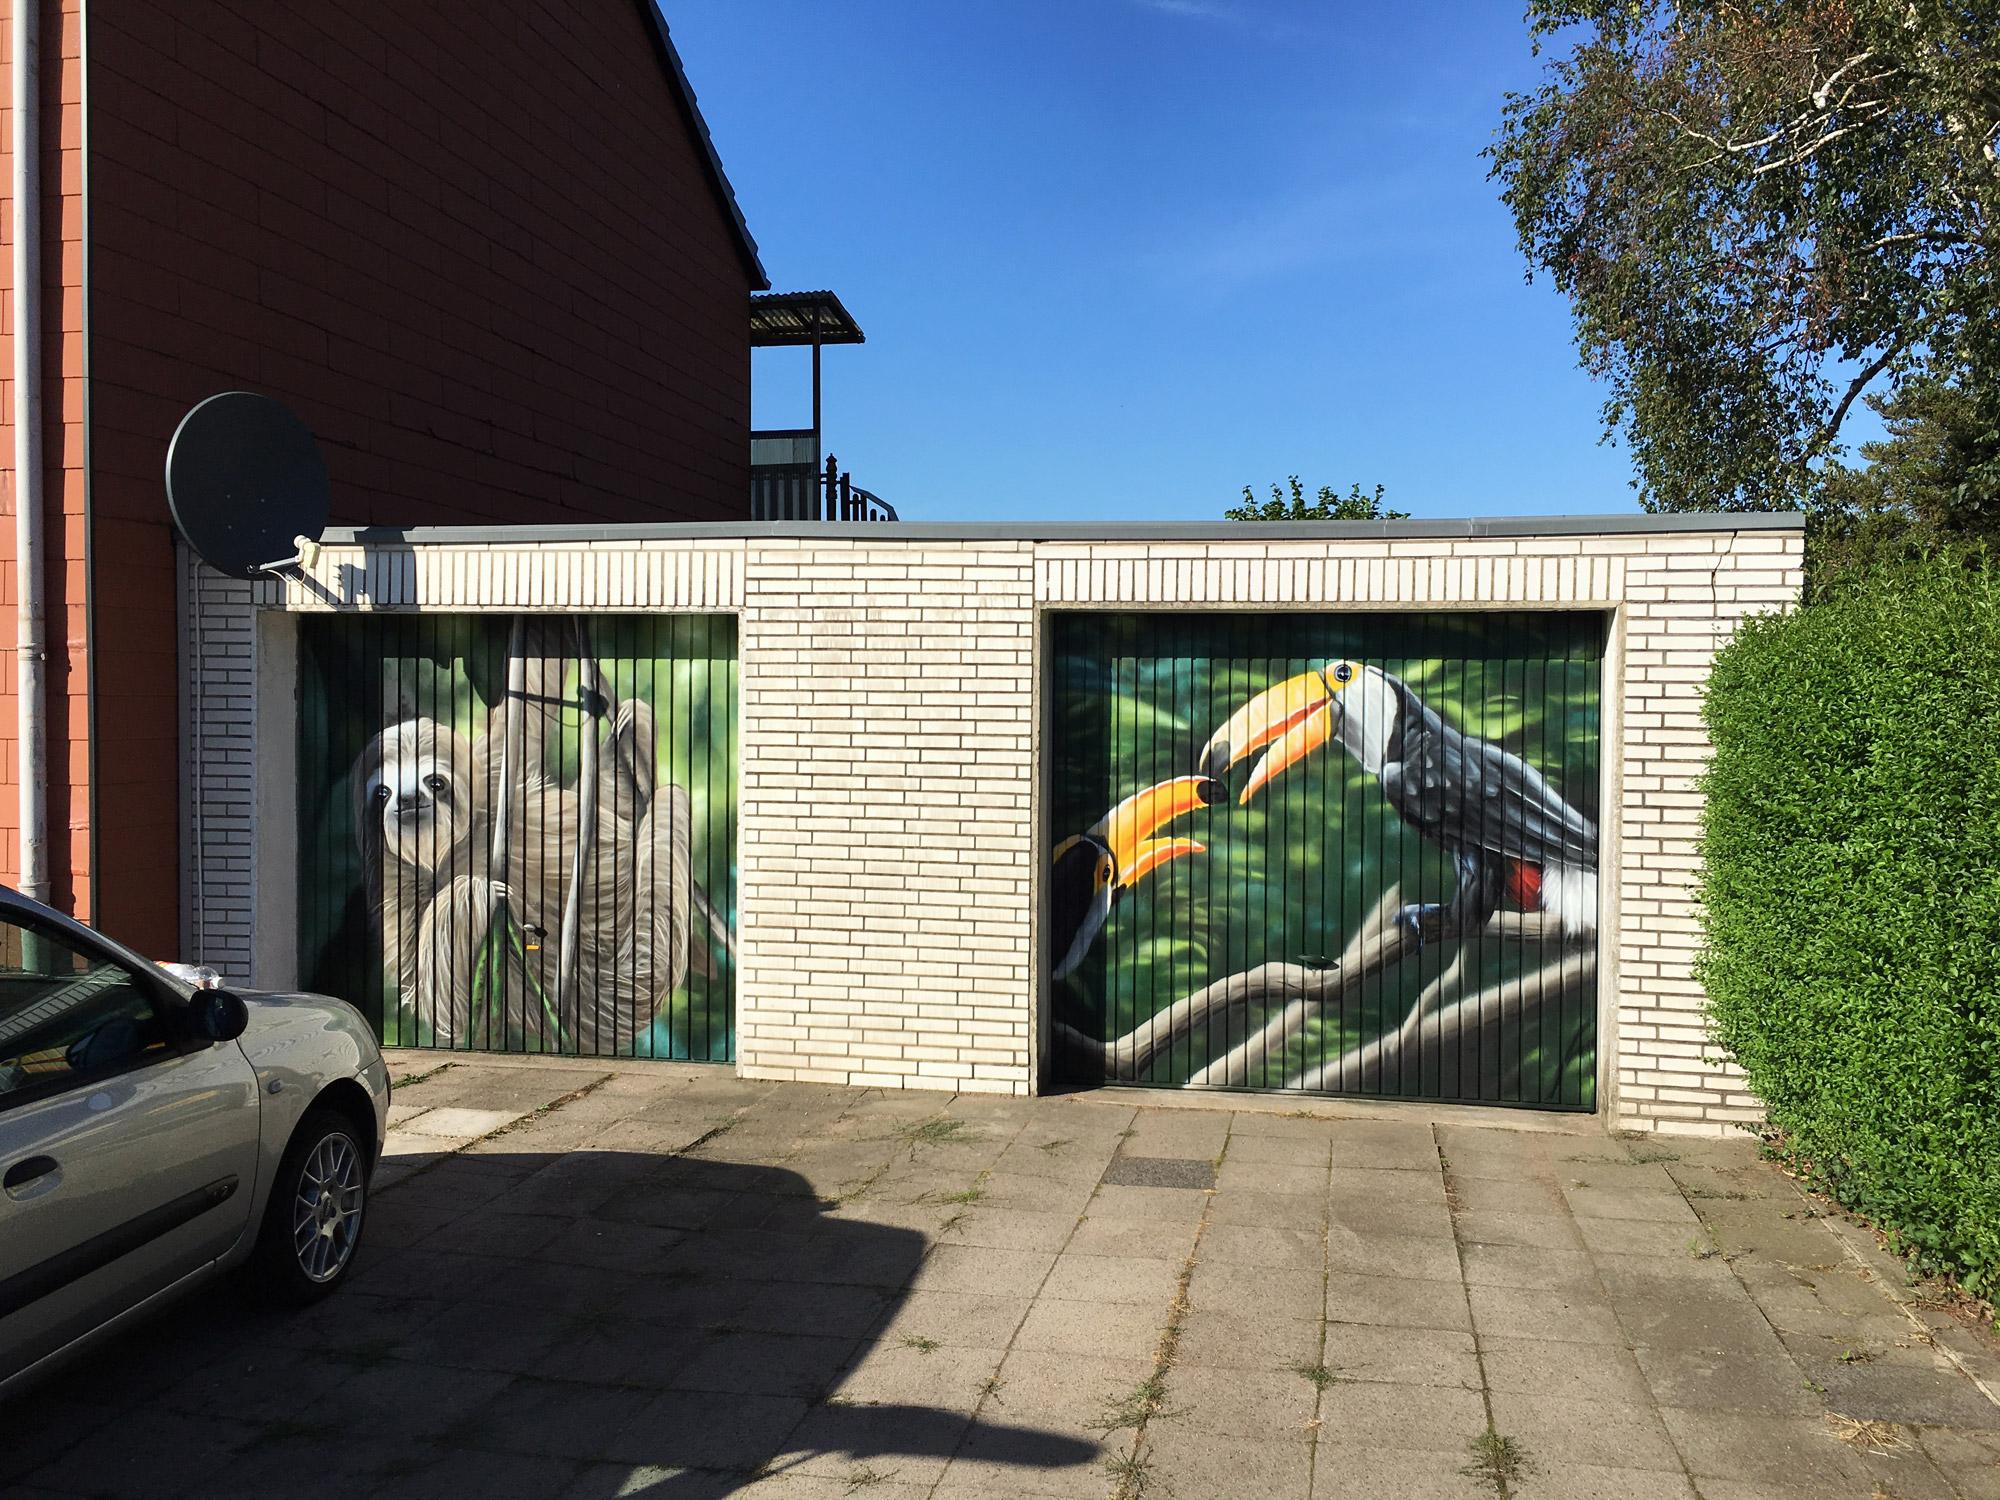 Graffiti Gestaltung